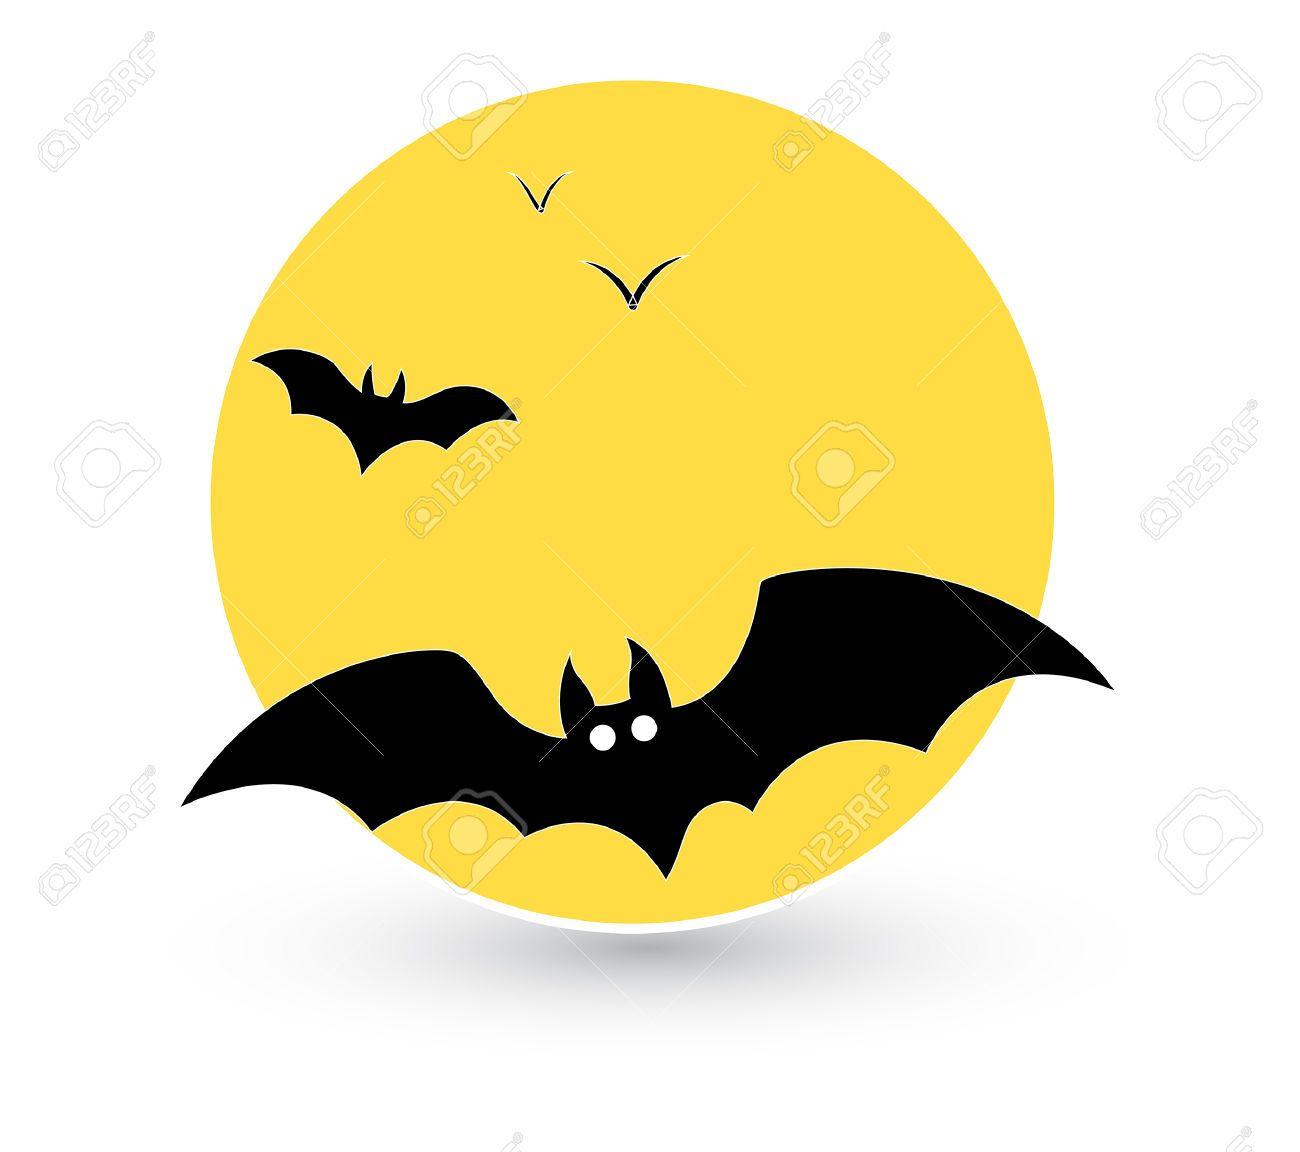 Halloween Png Bats Clipart - Halloween Bats Clipart Png | Transparent PNG  Download #240700 - Vippng